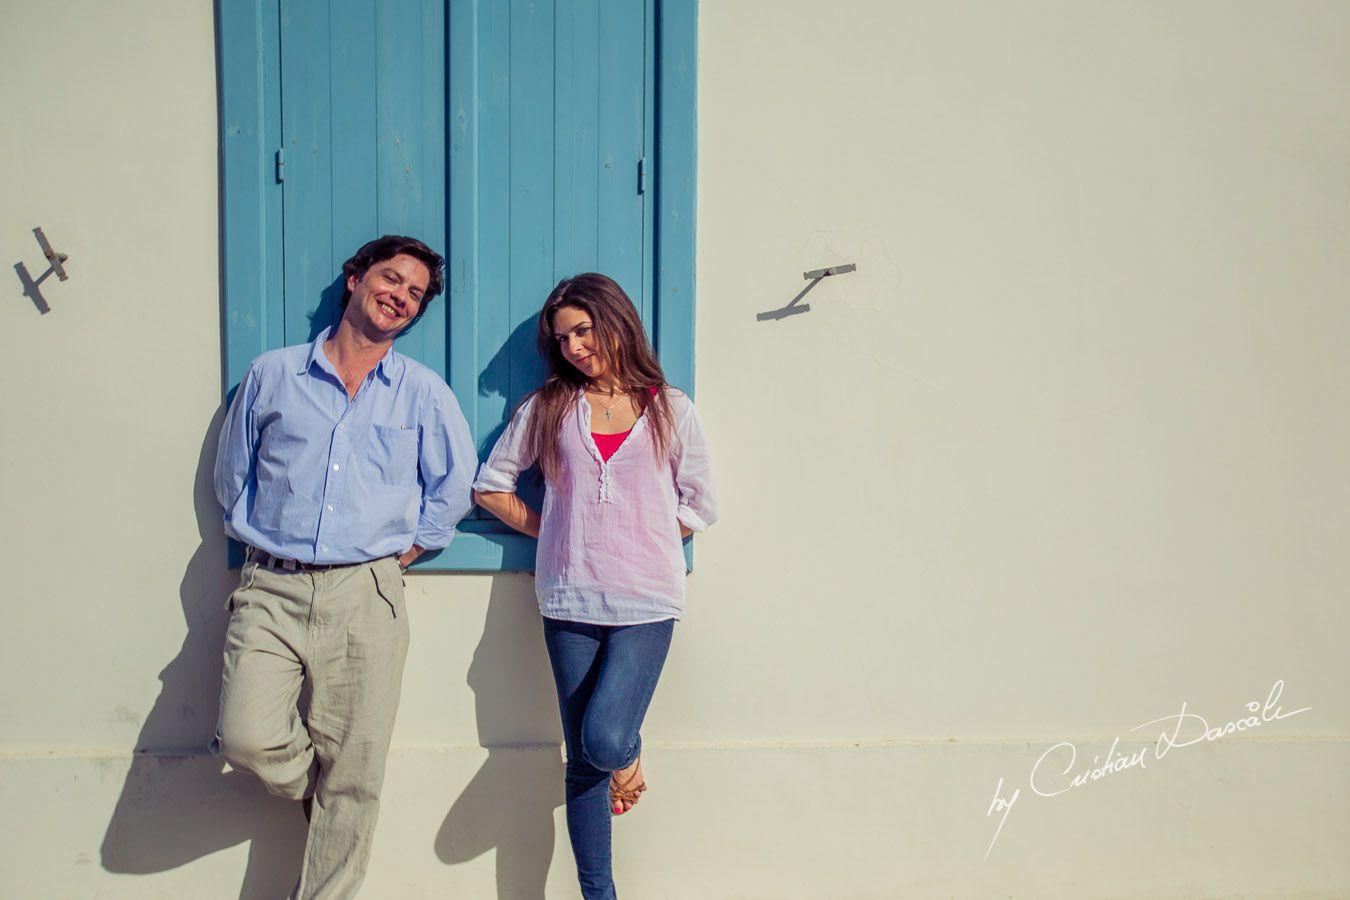 Engagement Photography - Justin & Irina. Cyprus Photographer: Cristian Dascalu